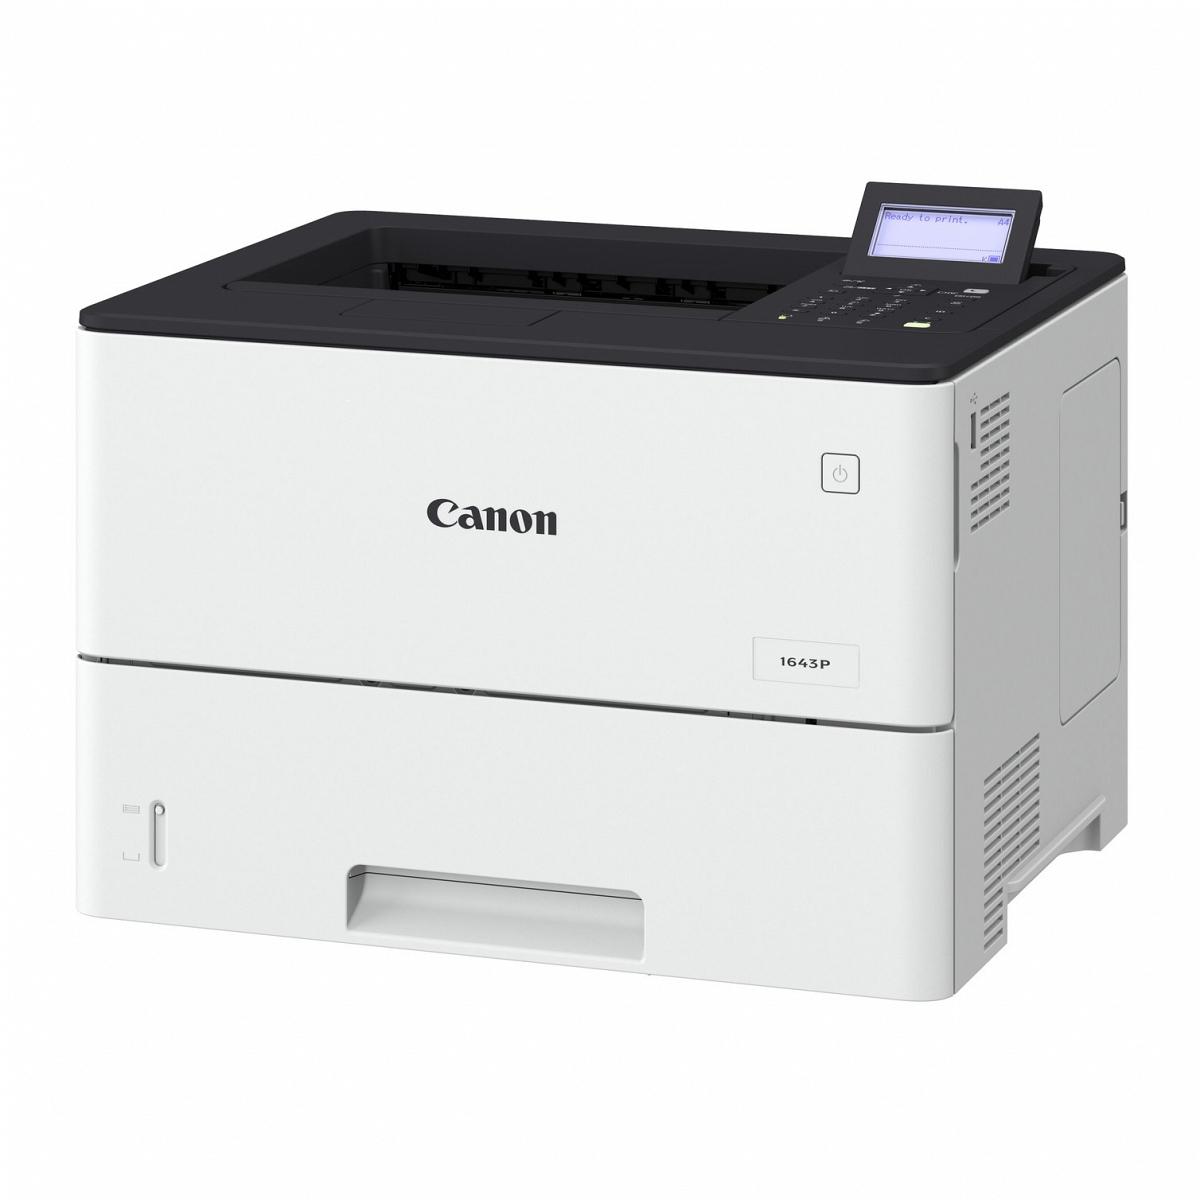 Tiskalnik Canon i-SENSYS X 1643P